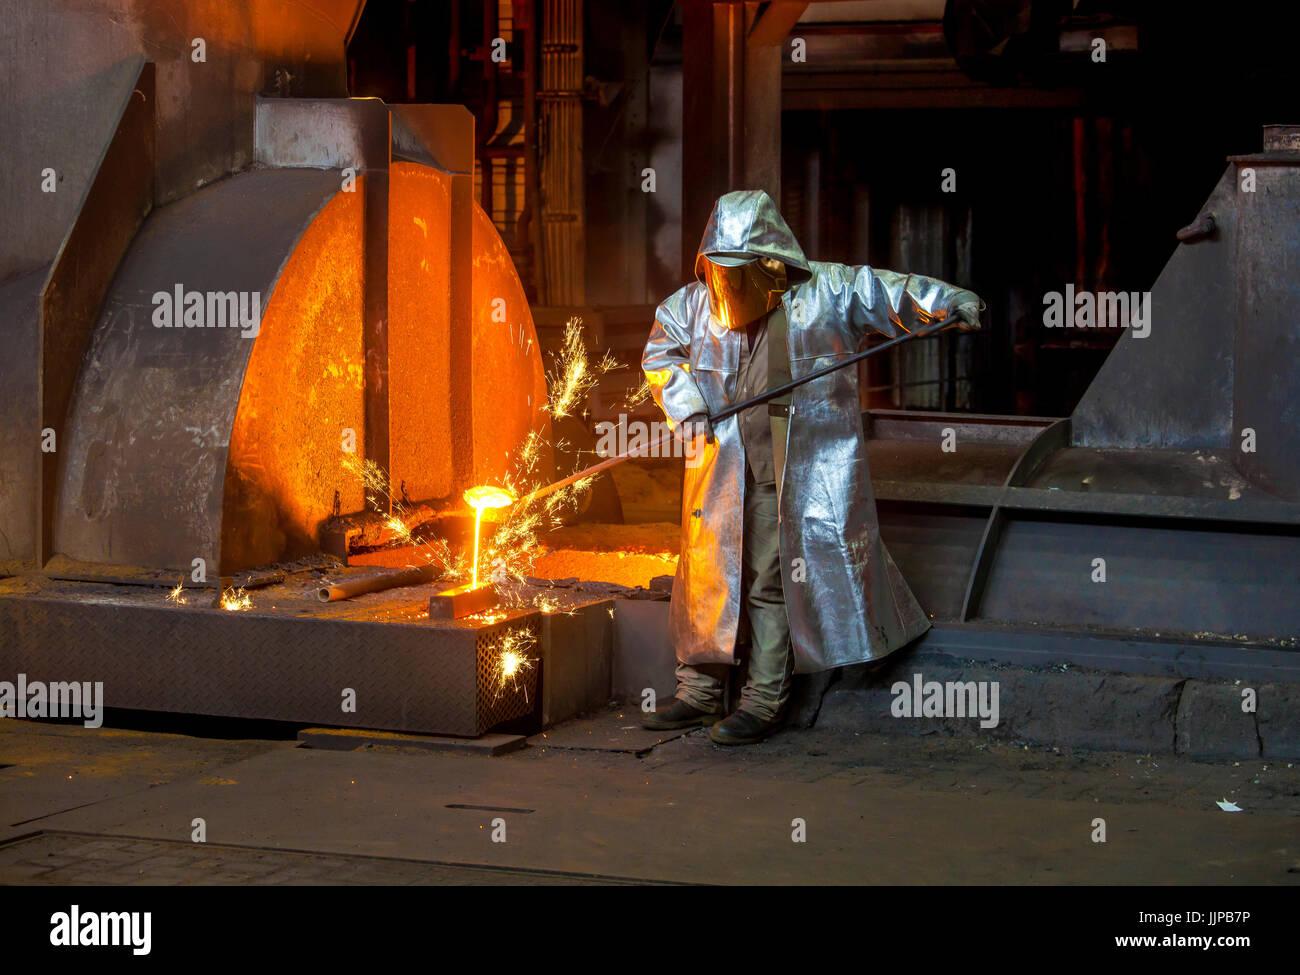 ThyssenKrupp steelwork, Duisburg, Ruhr area, North Rhine-Westphalia, Germany, Europe.  ThyssenKrupp HŸttenwerk, - Stock Image